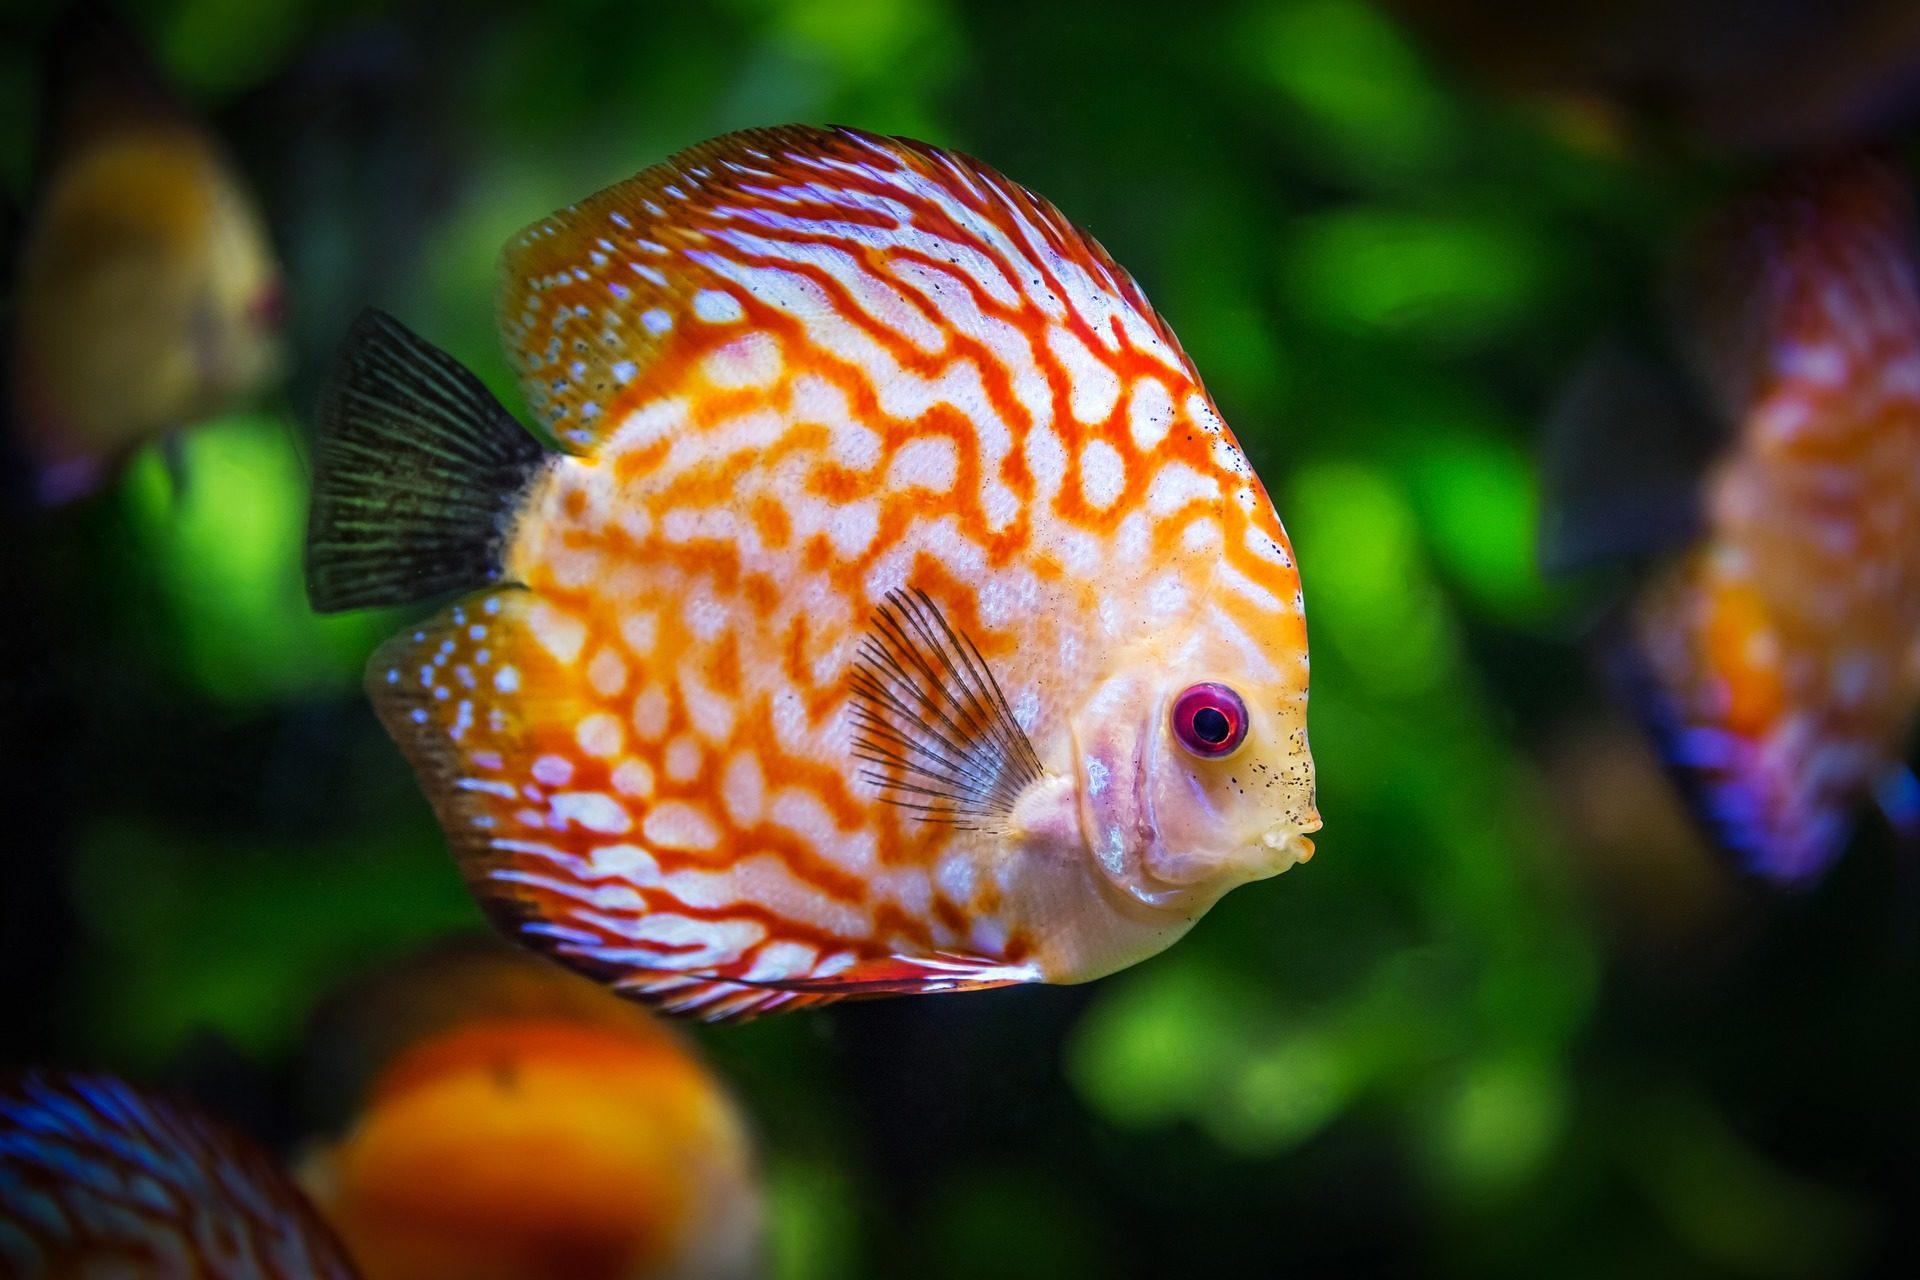 Fisch, Disk, bunte, tropische, Aquarium - Wallpaper HD - Prof.-falken.com